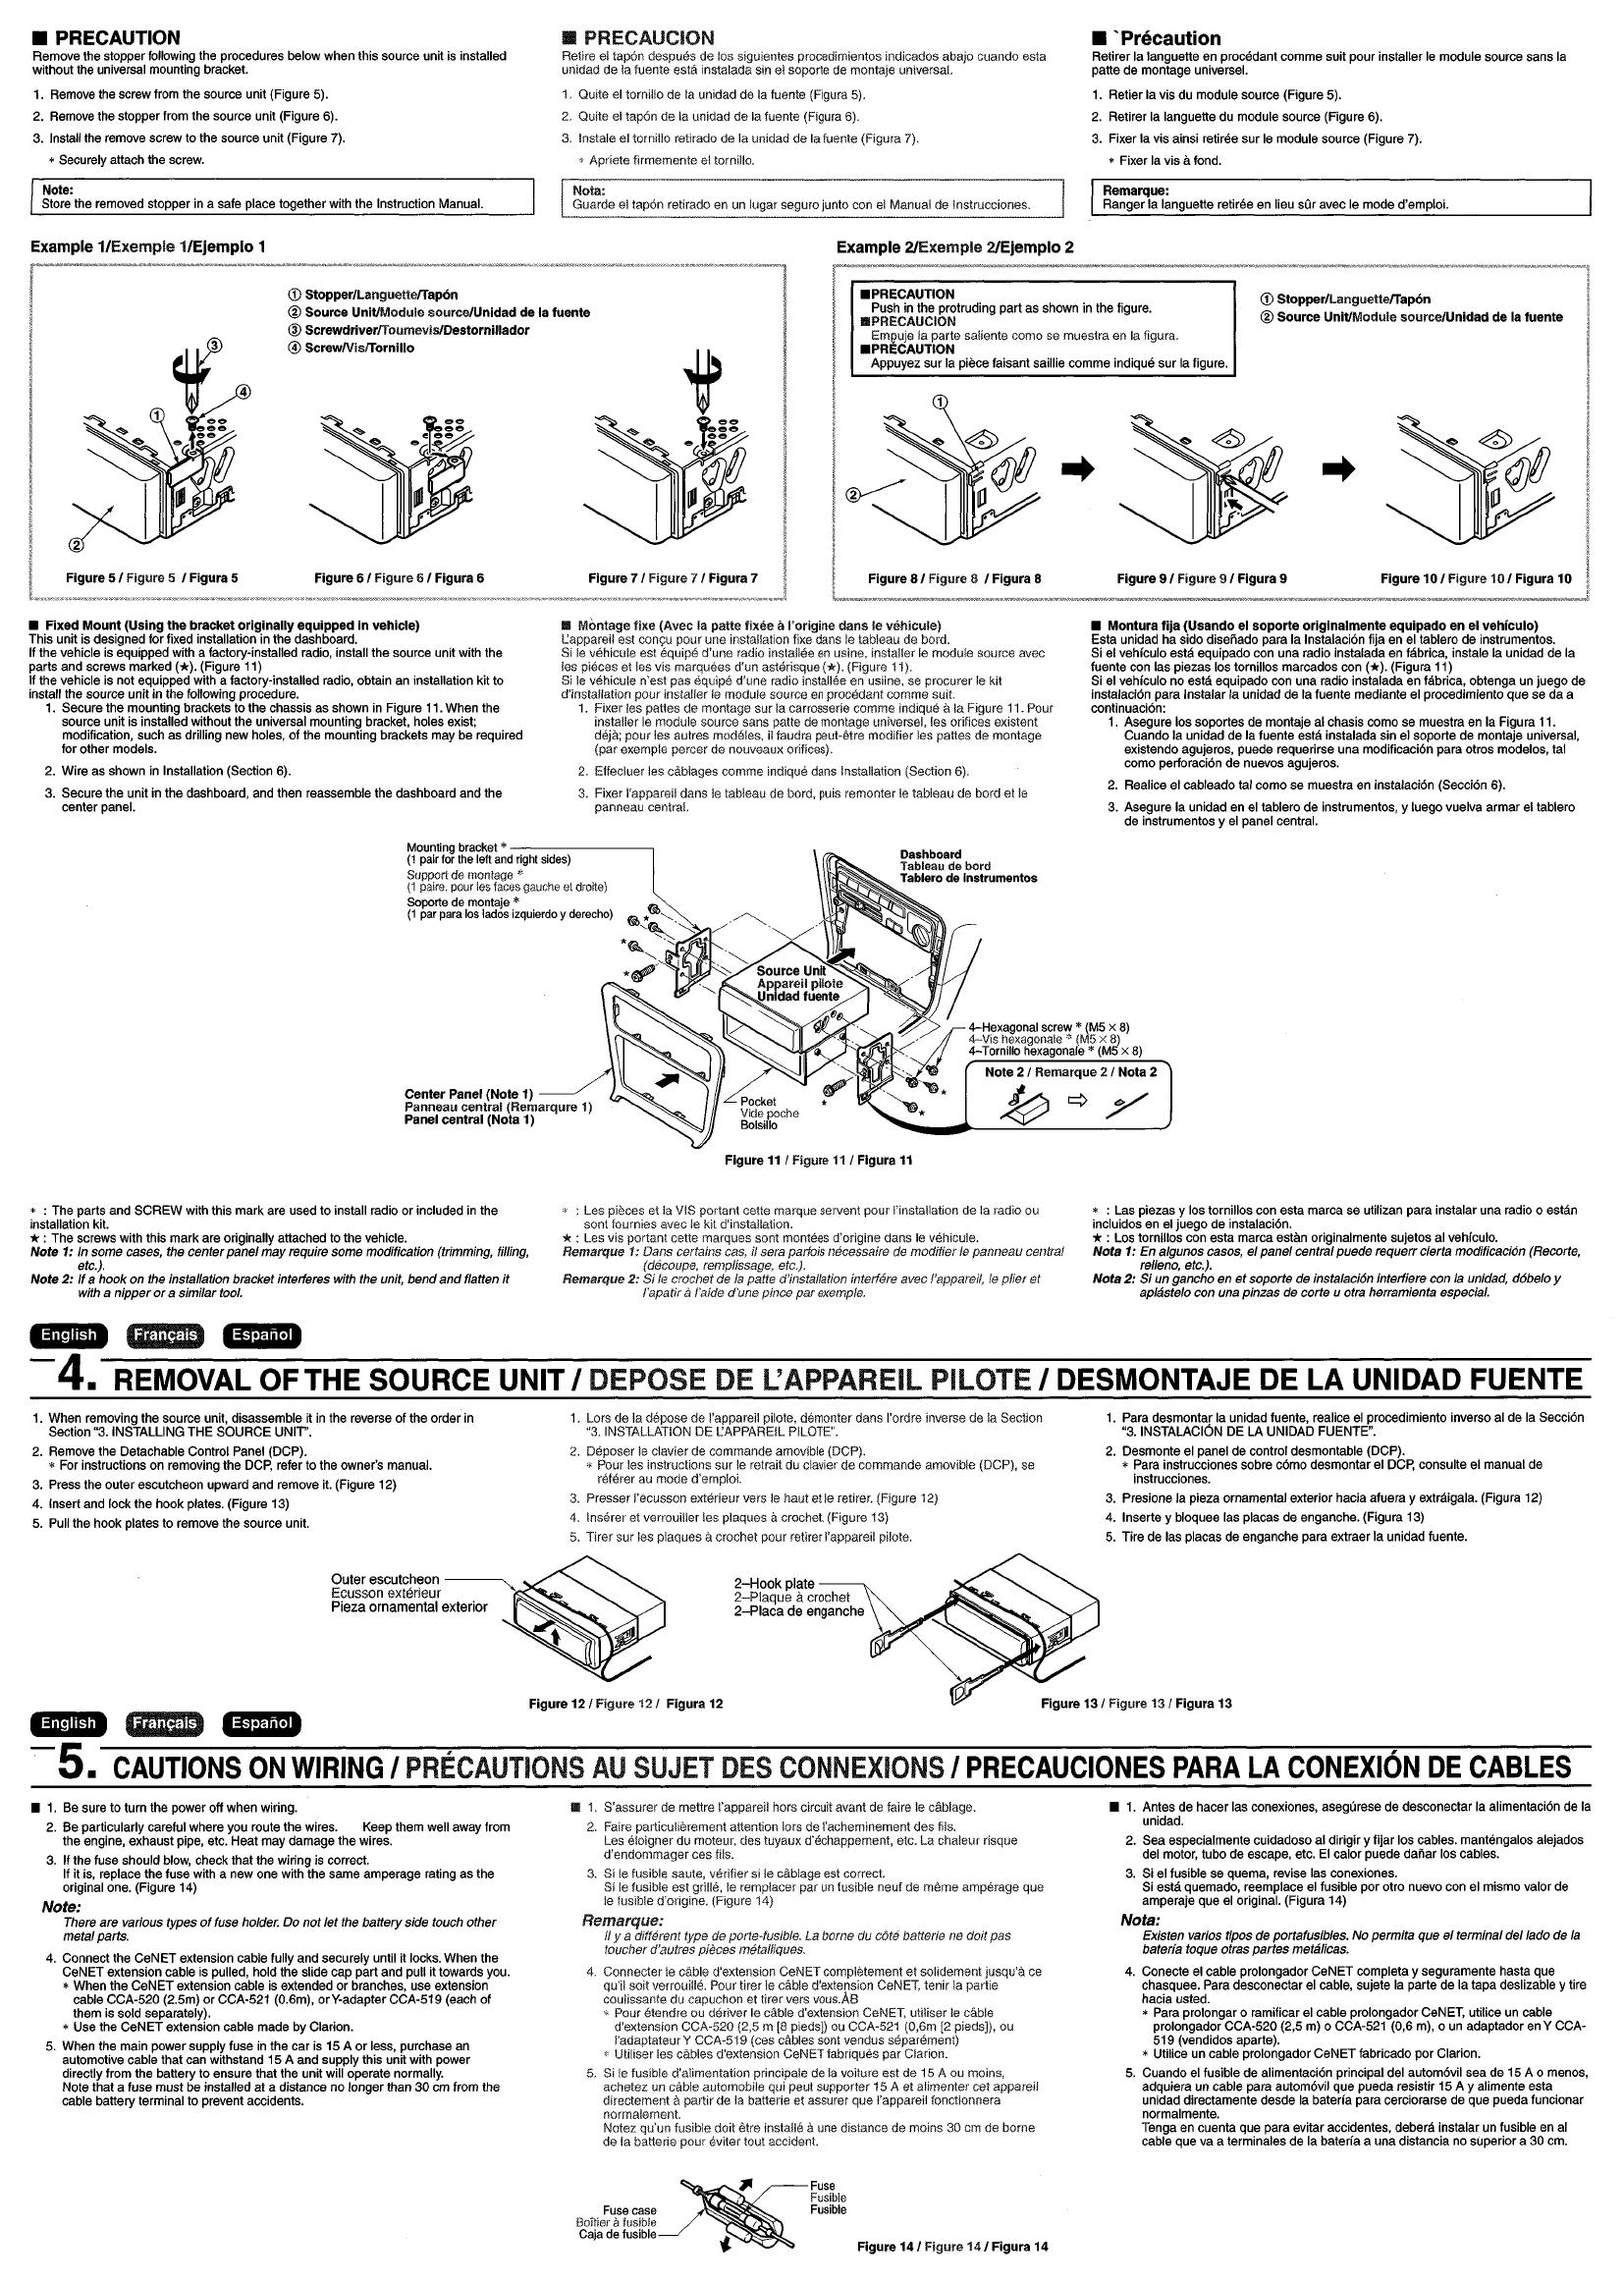 Clarion Dxz445 Guide 1999 Chrysler T 038 C Limited 38 Digital Transmission Fuse Box Diagram Array Proaudio Dxz645mp Users Manual 280pe2621ba 00 0 Rh Usermanual Wiki